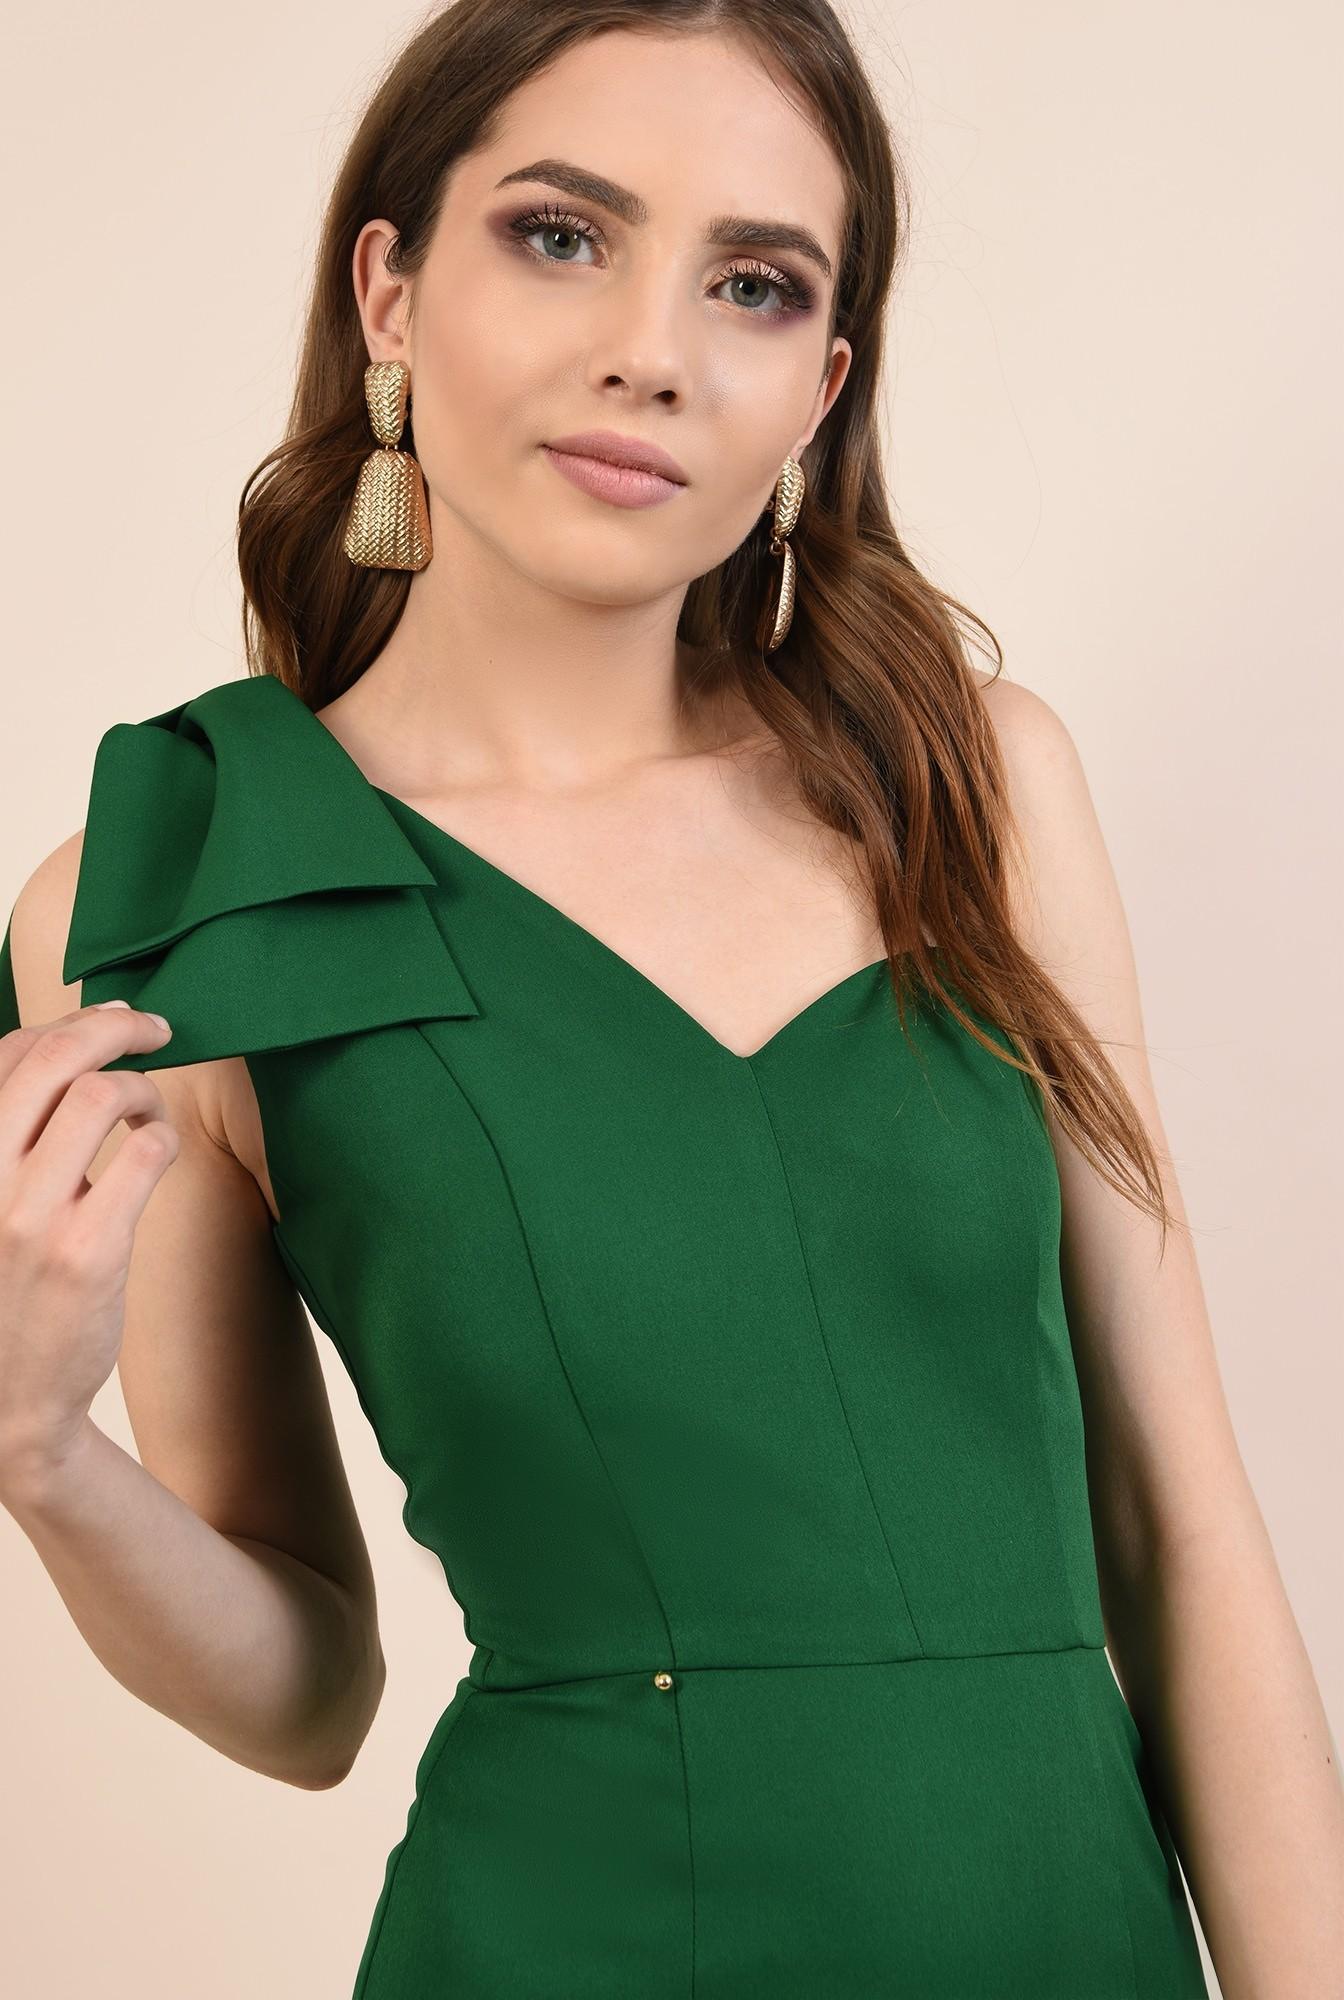 rochie de ocazie, verde, clepsidra, funde la umar, rochii elegante online